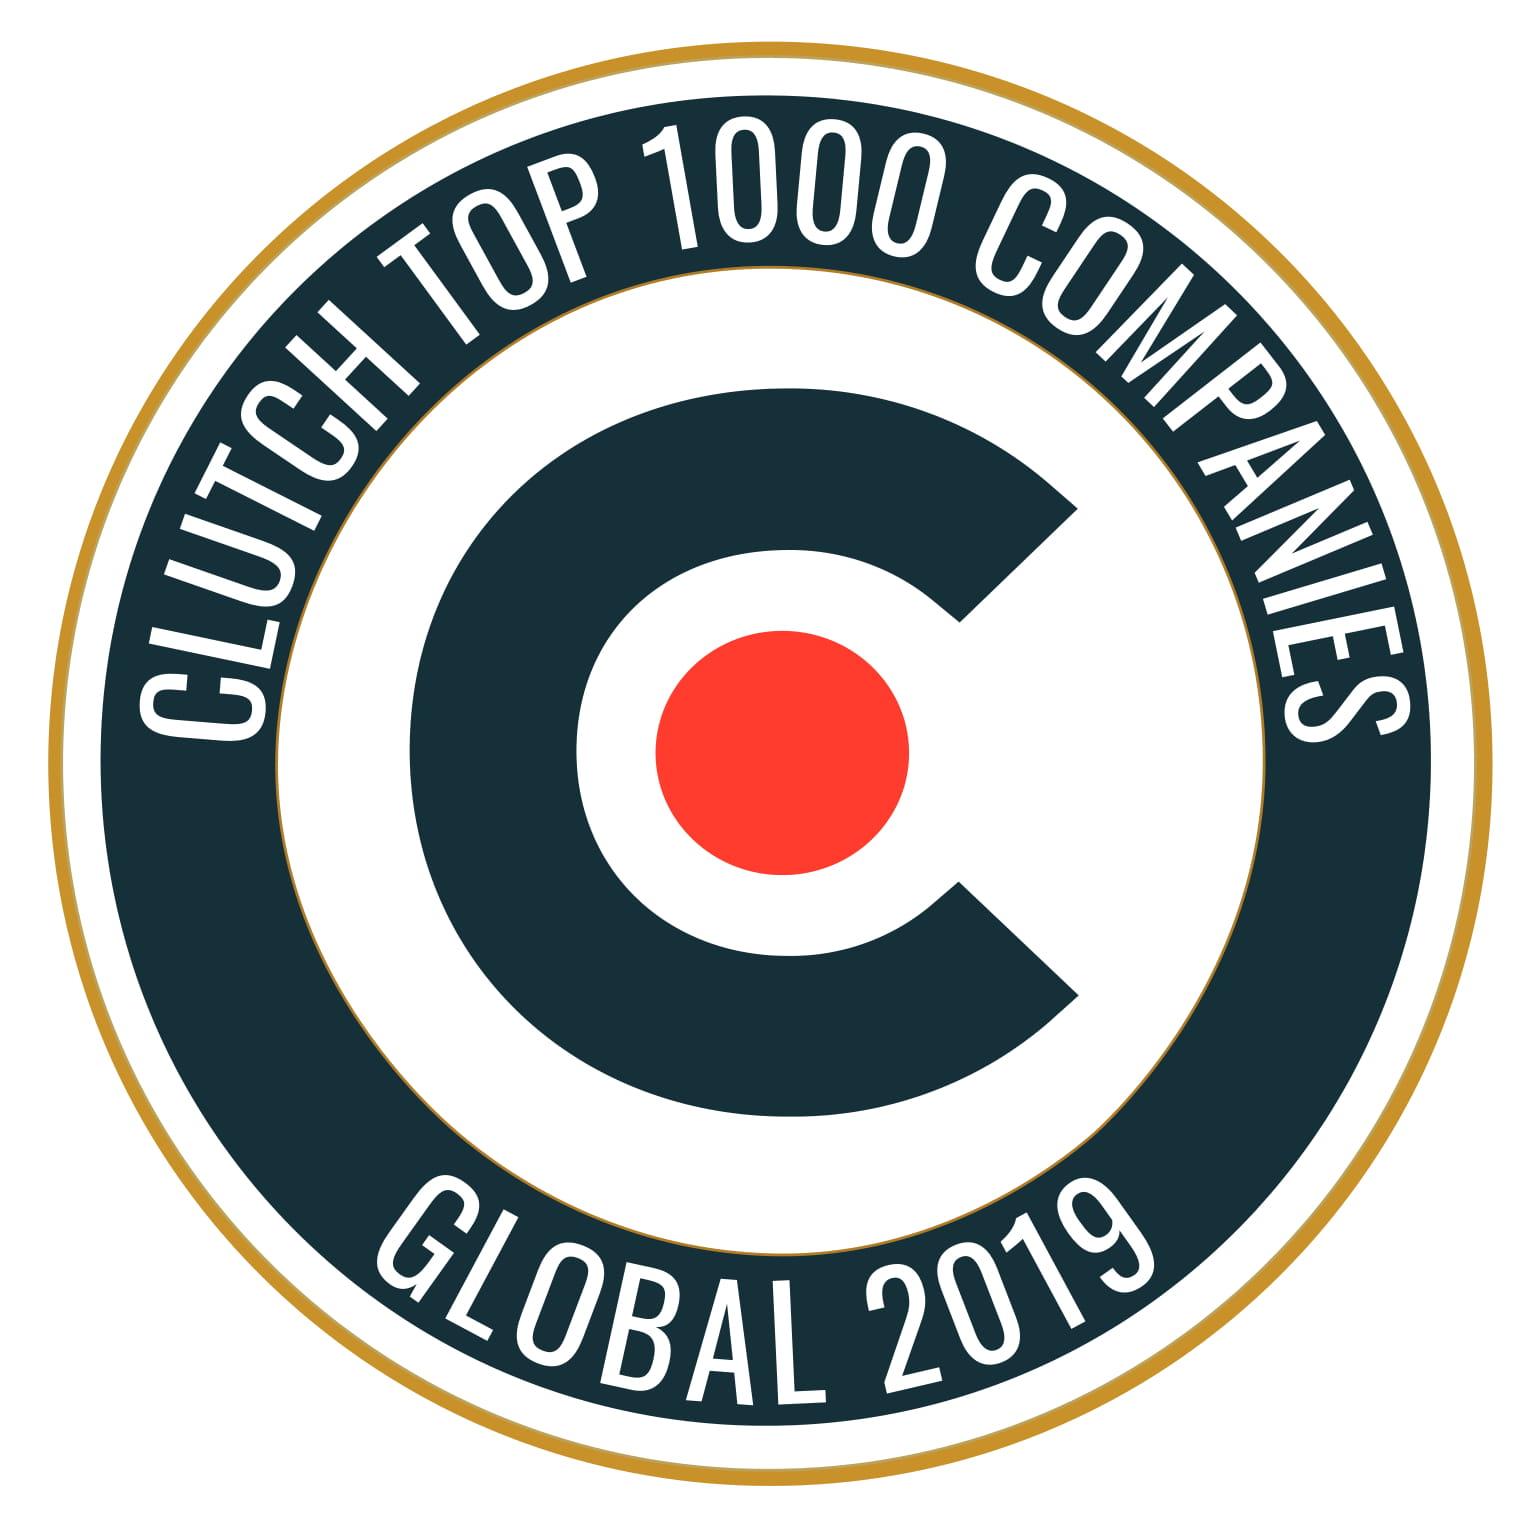 Clutch recognizes Cubix in its exclusive 2019 Clutch 1000 List